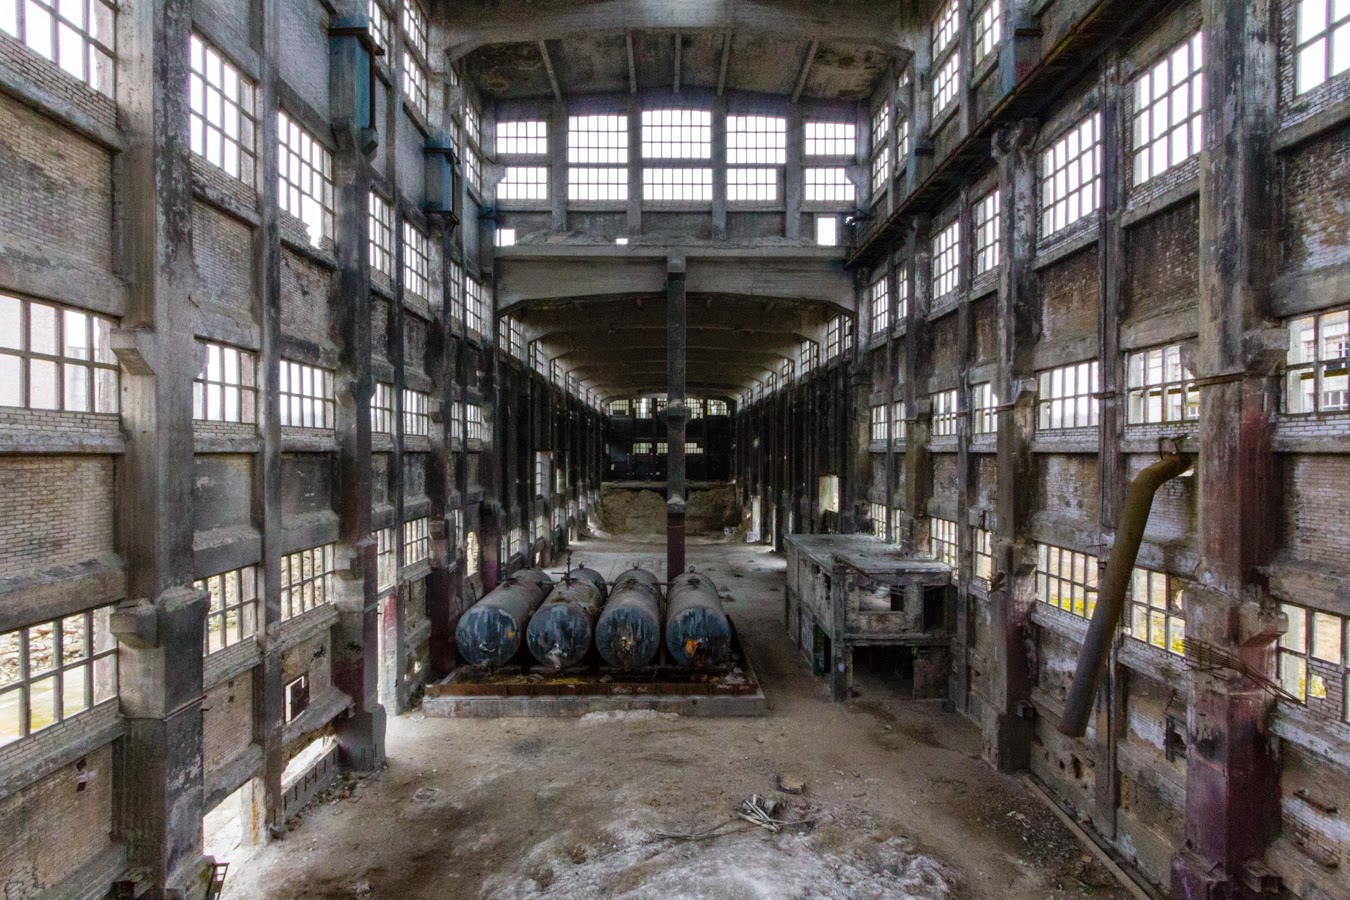 Chemiewerk+Ru%CC%88dersdorf+Abandoned+ch